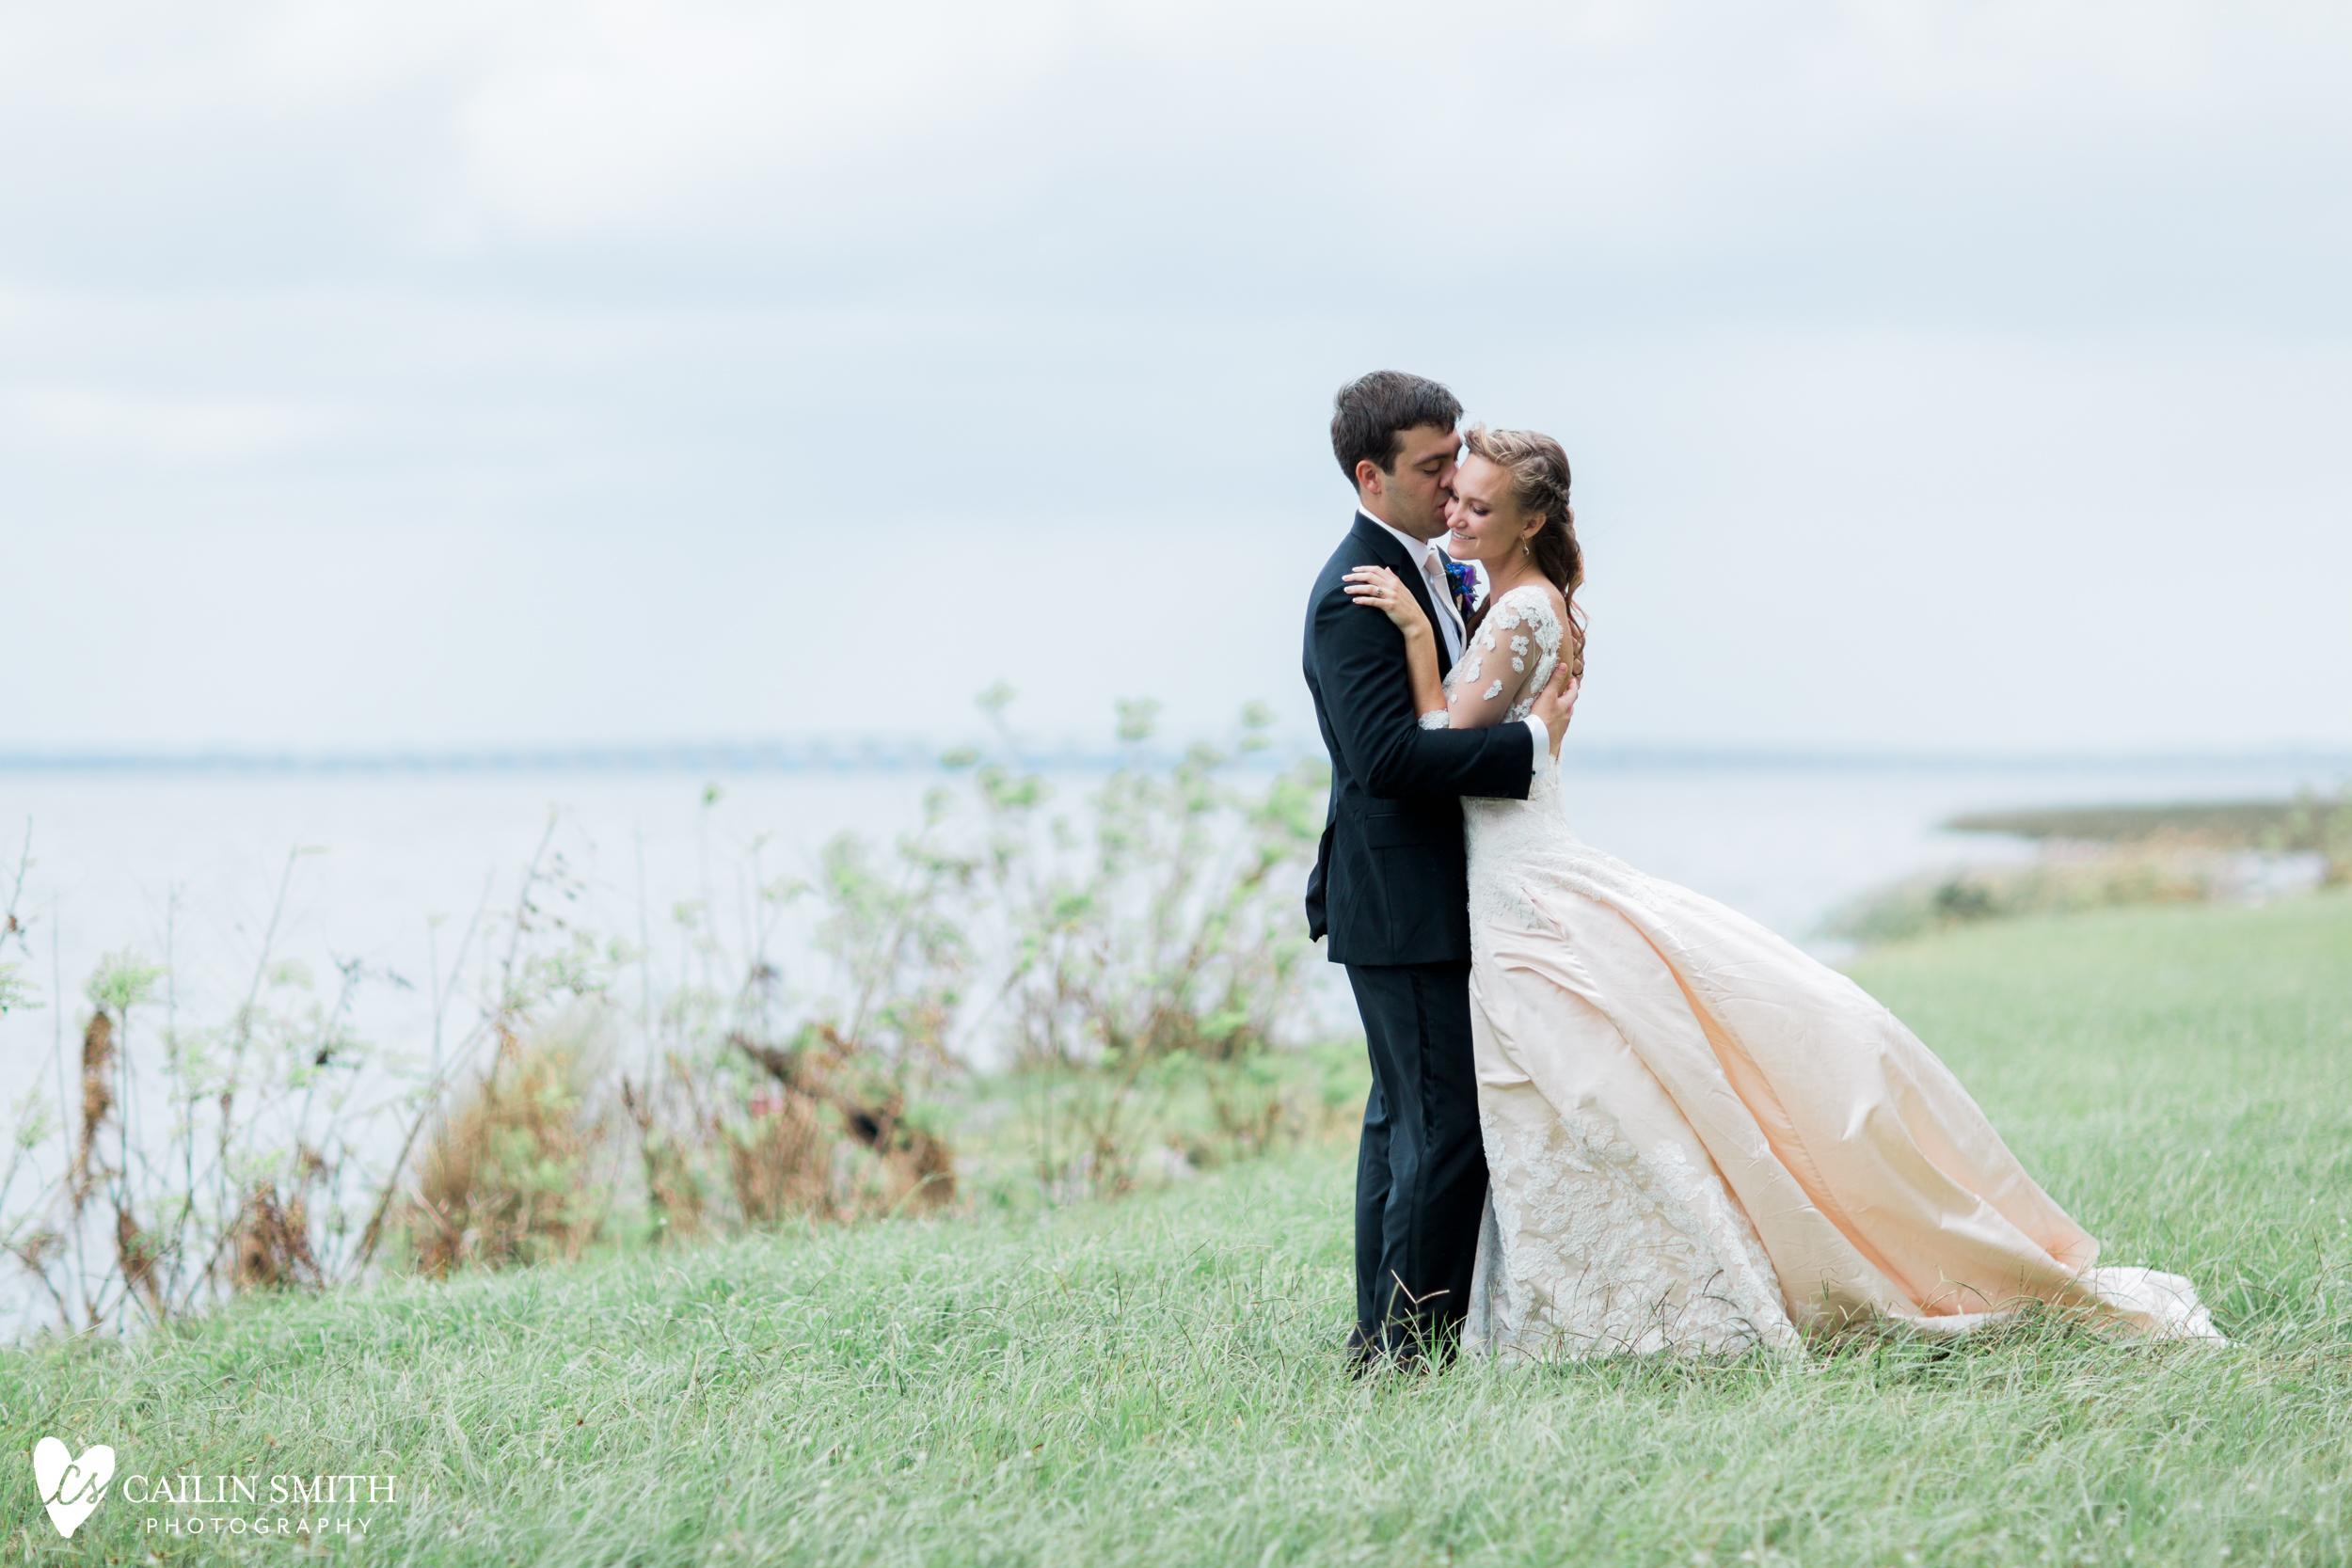 Shannon_David_Grace_Episcopal_Church_Wedding_photography_010.jpg